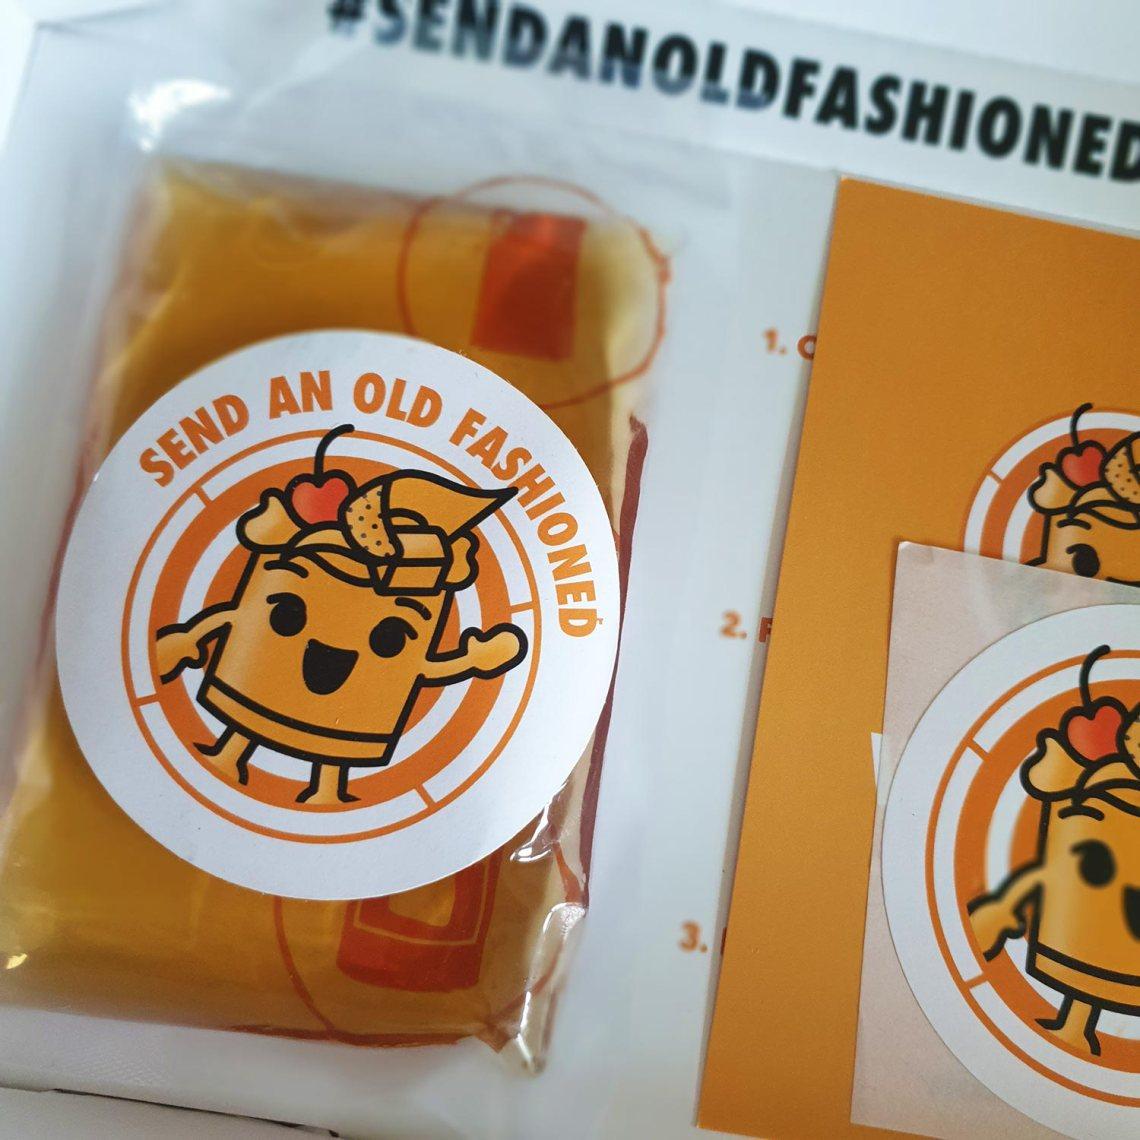 Send an Old Fashioned - Female Original